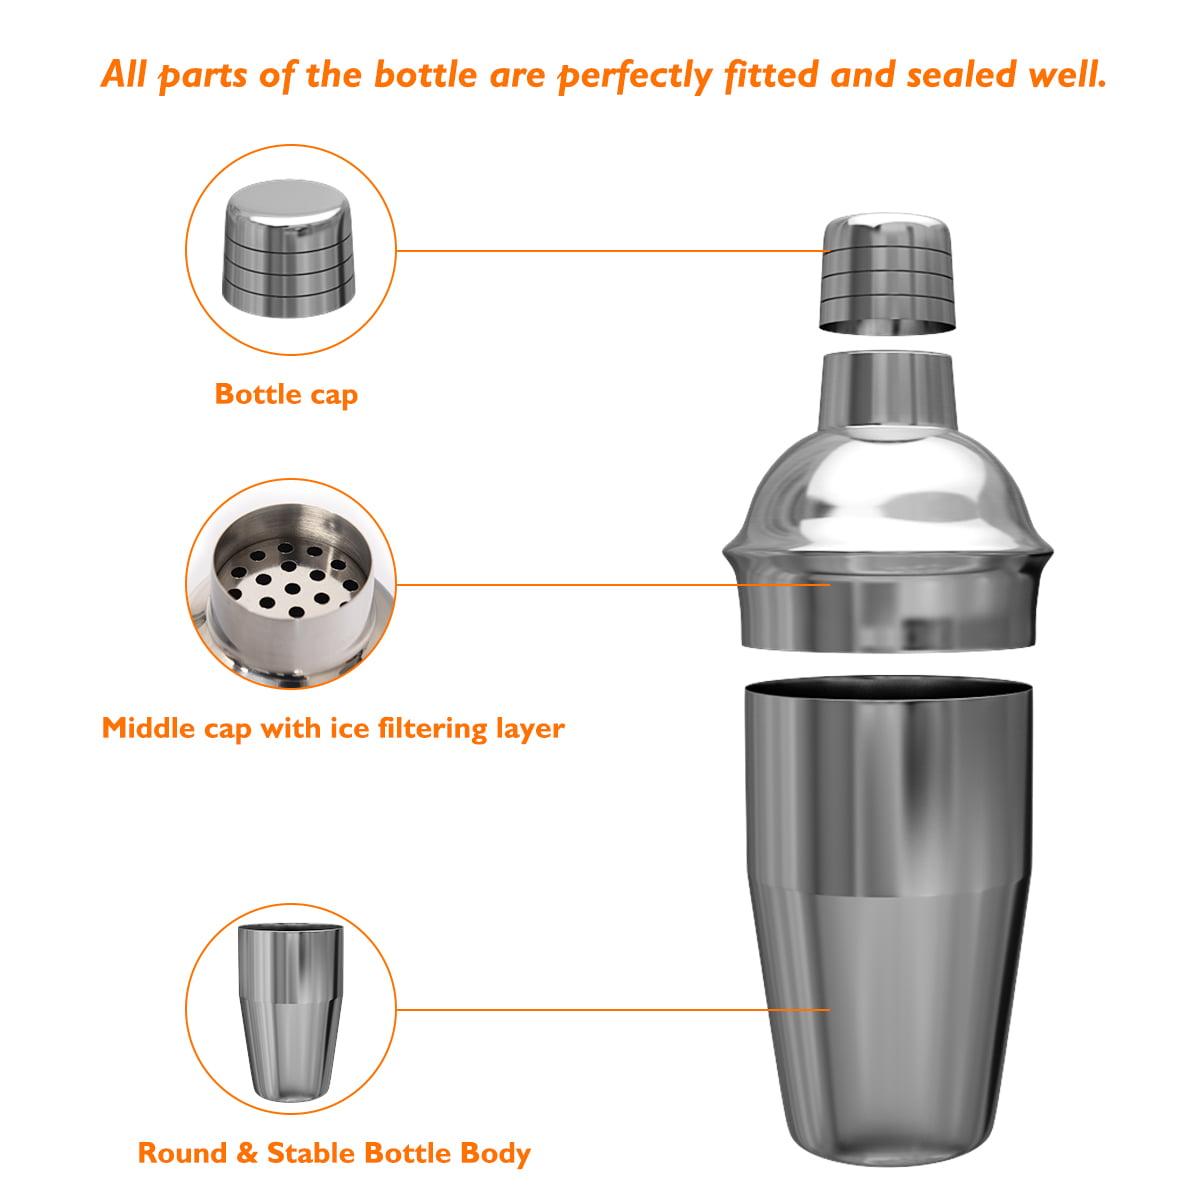 Stainless Steel Cocktail Shaker Mixer Drink Bartender Martini Bar Set Tool Kit